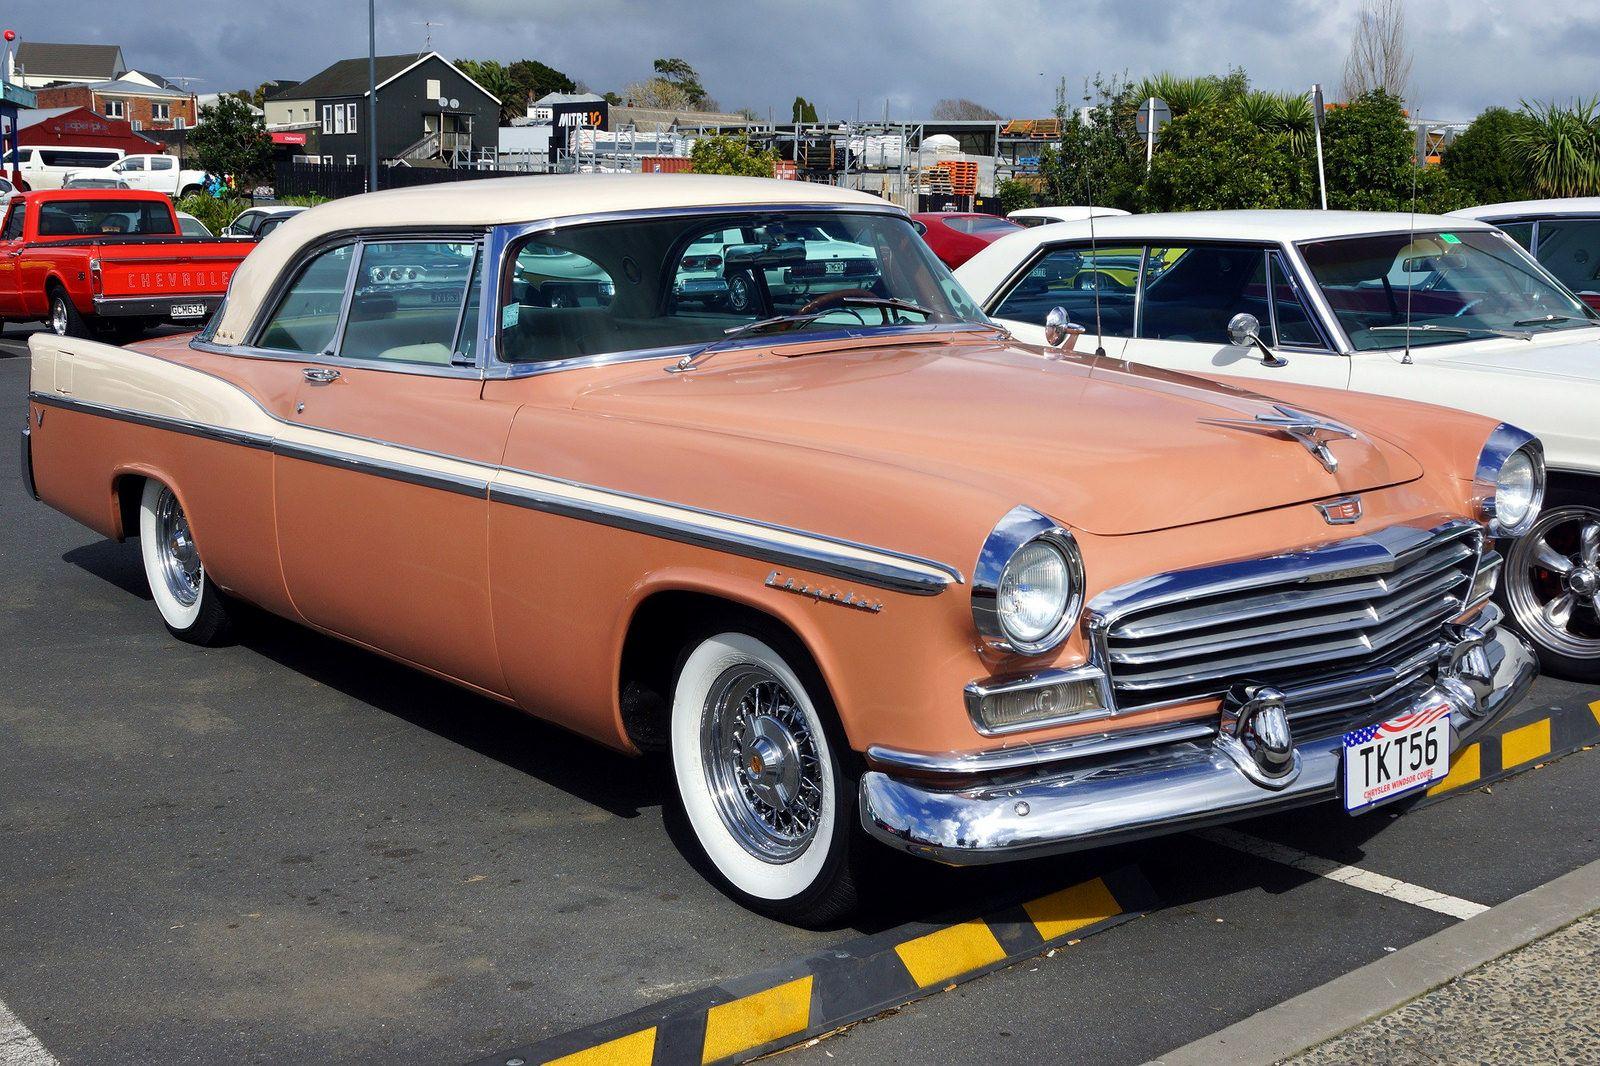 1956 Chrysler Windsor Coupe | Cars, Mopar and Vehicle